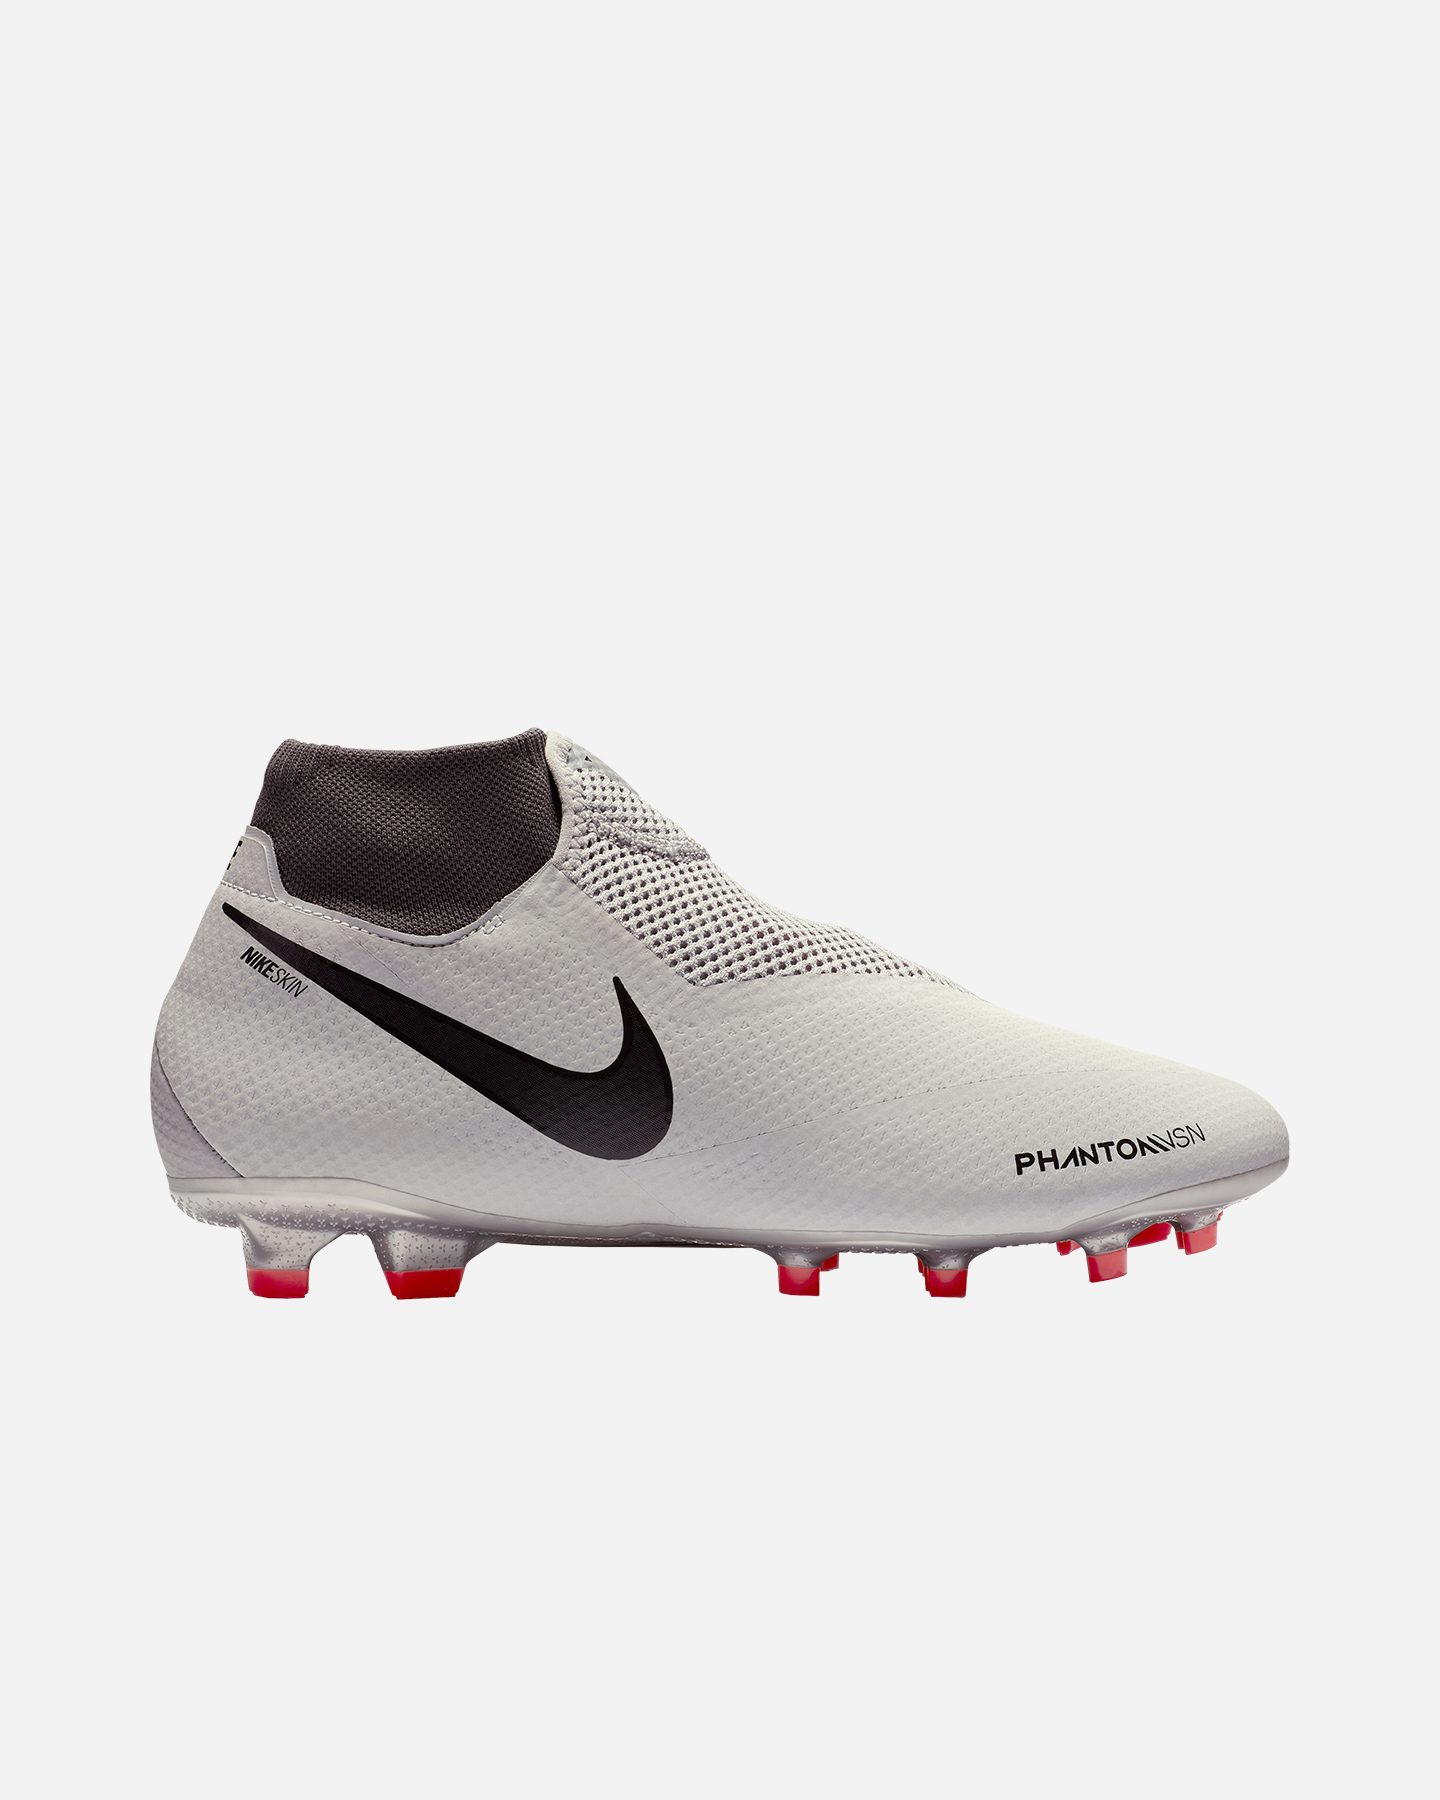 nike skin calcio scarpe